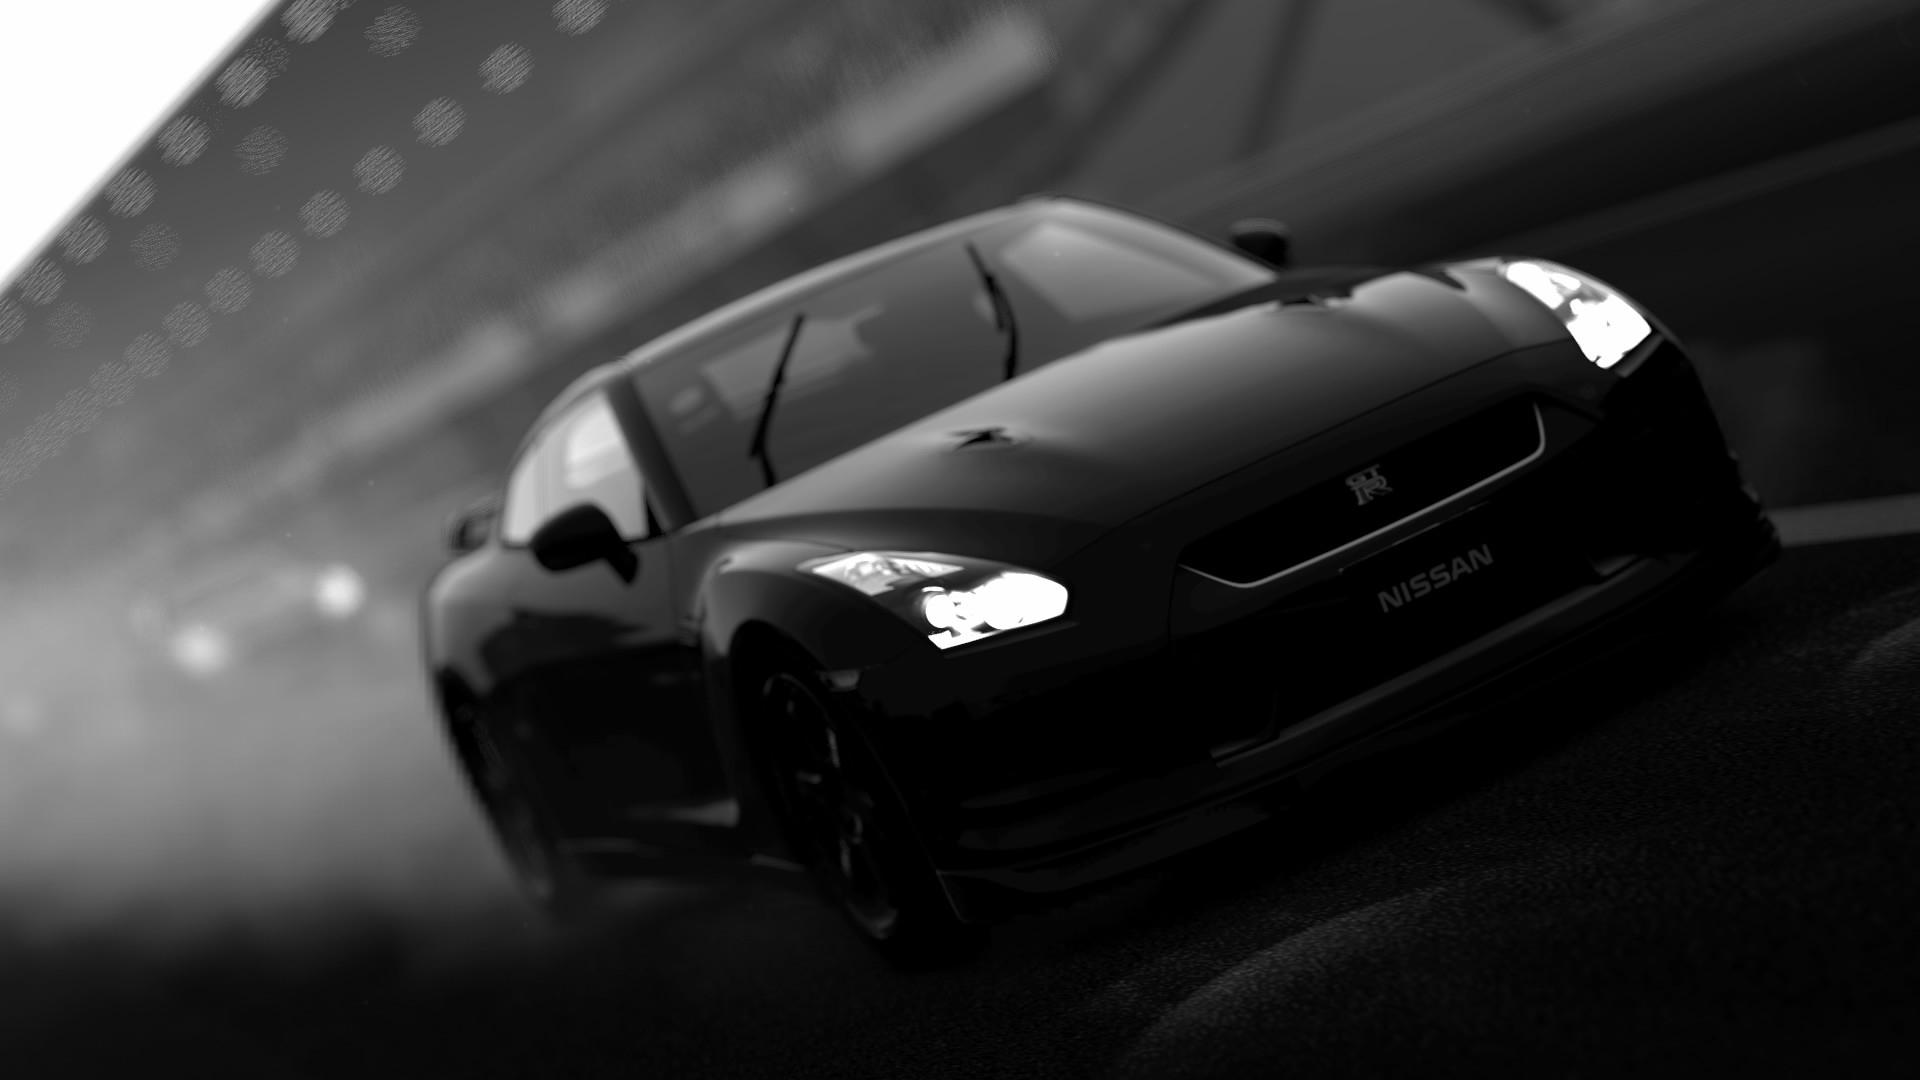 car black wallpaper hd. - media file | pixelstalk